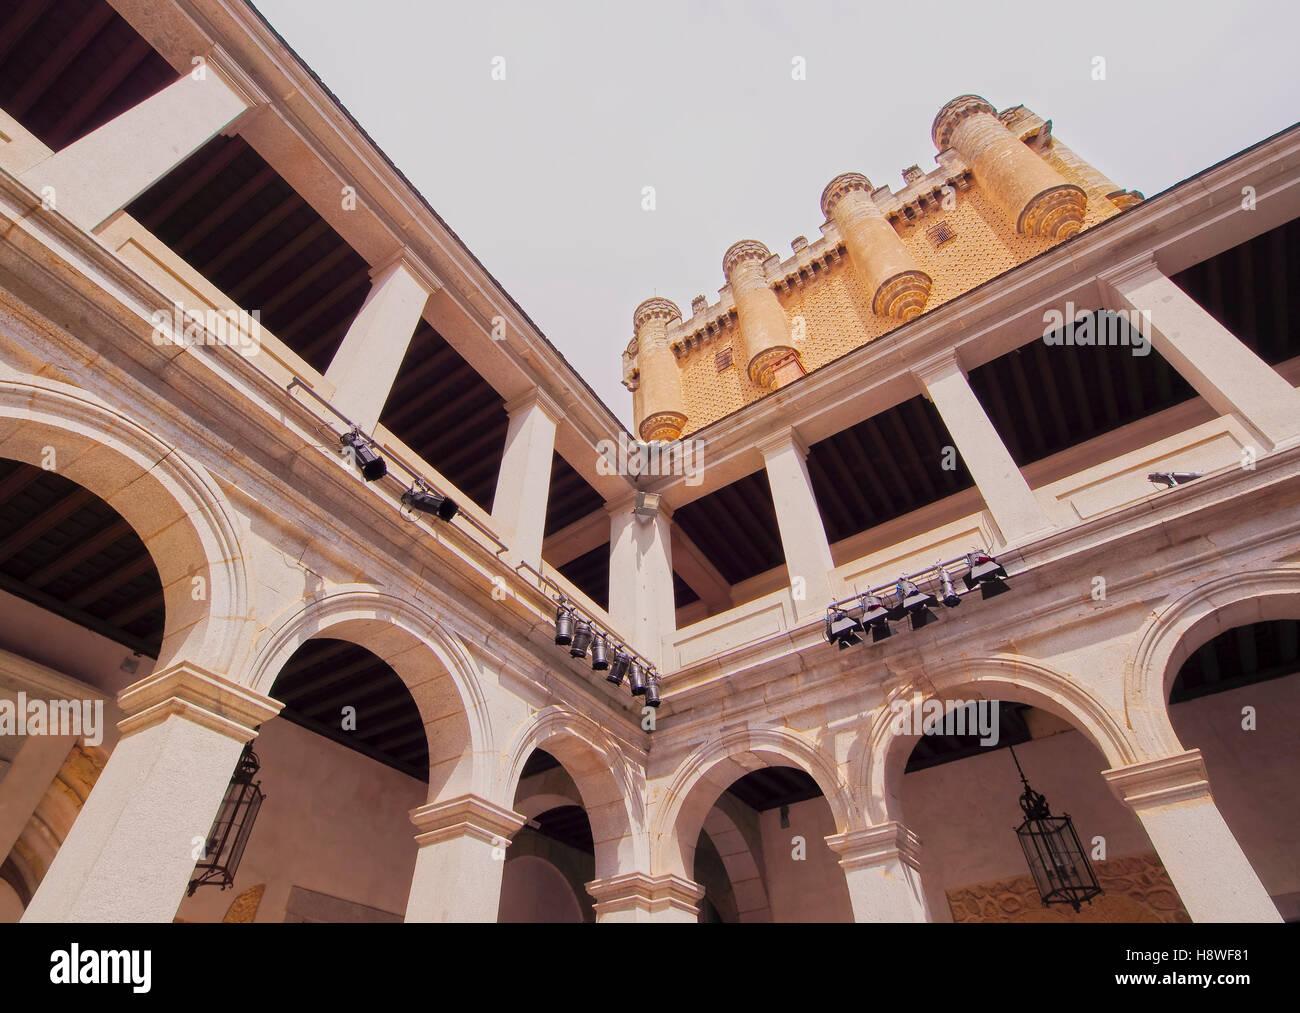 Spain, Castile and Leon, Segovia, View of the Alcazar. Stock Photo